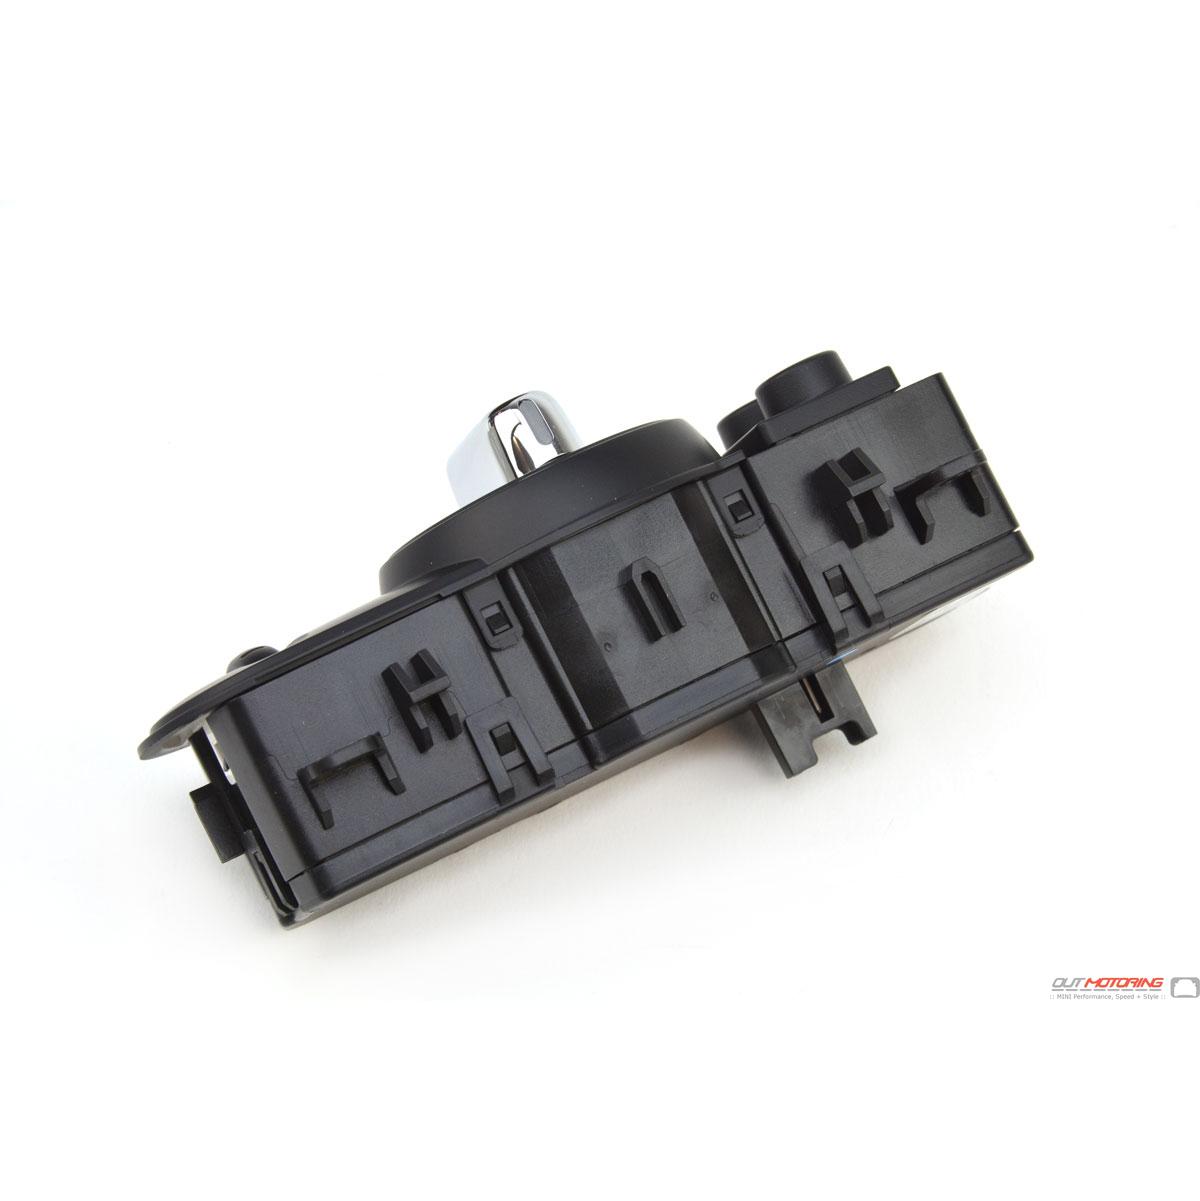 61316824879 Mini Cooper Replacement Parts Control Element